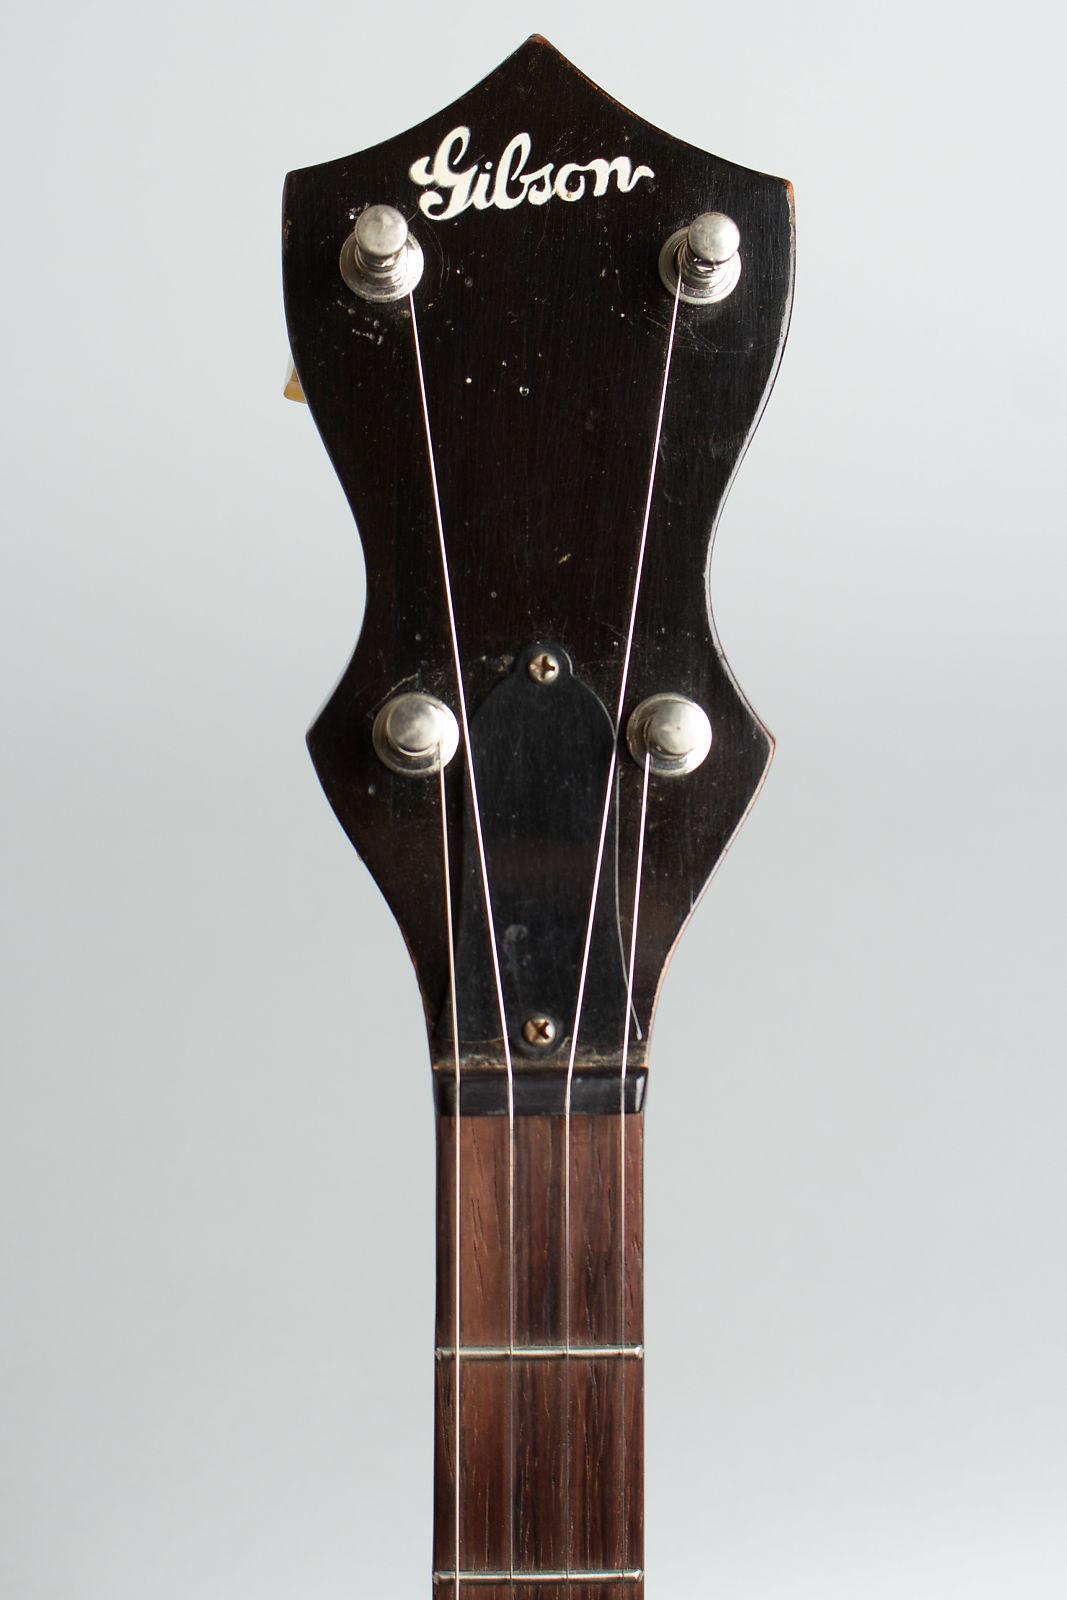 Gibson  RB-00 5 String Banjo (1940), ser. #F559-1, period black hard shell case.